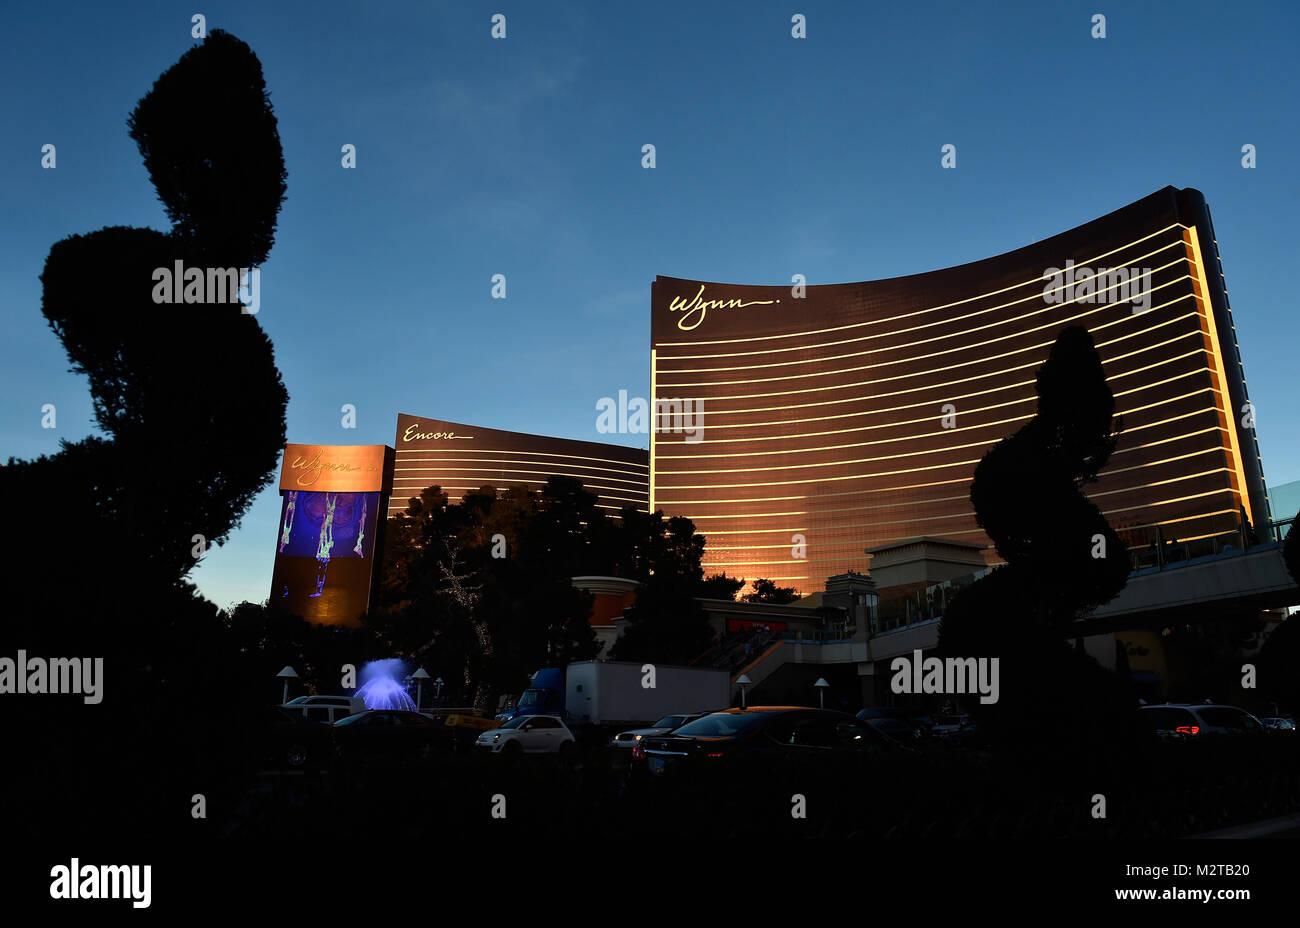 Casino Employees Stock Photos & Casino Employees Stock Images - Alamy